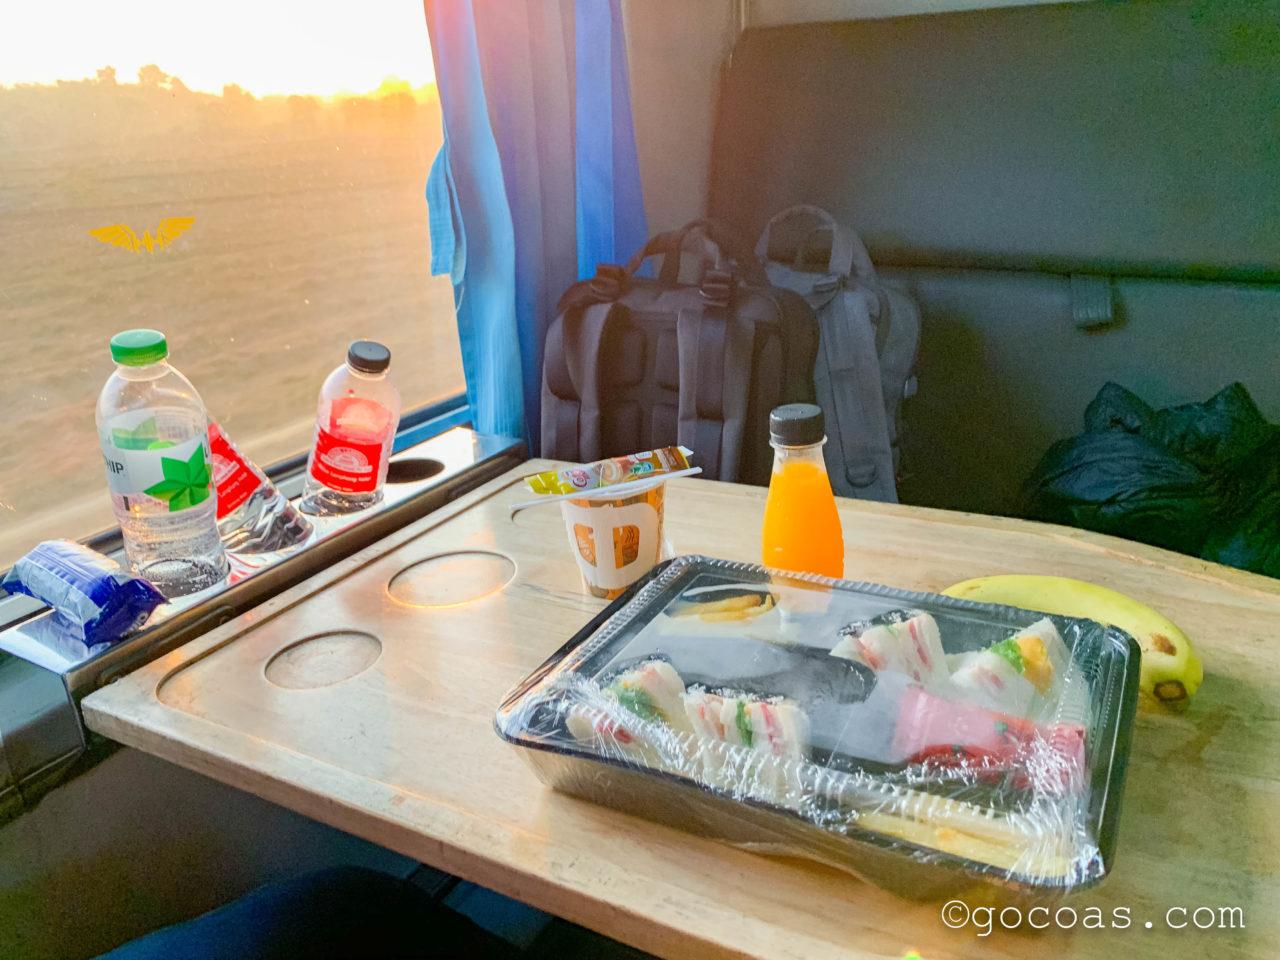 Hua Lamphong駅で乗った電車内の座席で食べた朝ごはんのサンドイッチ